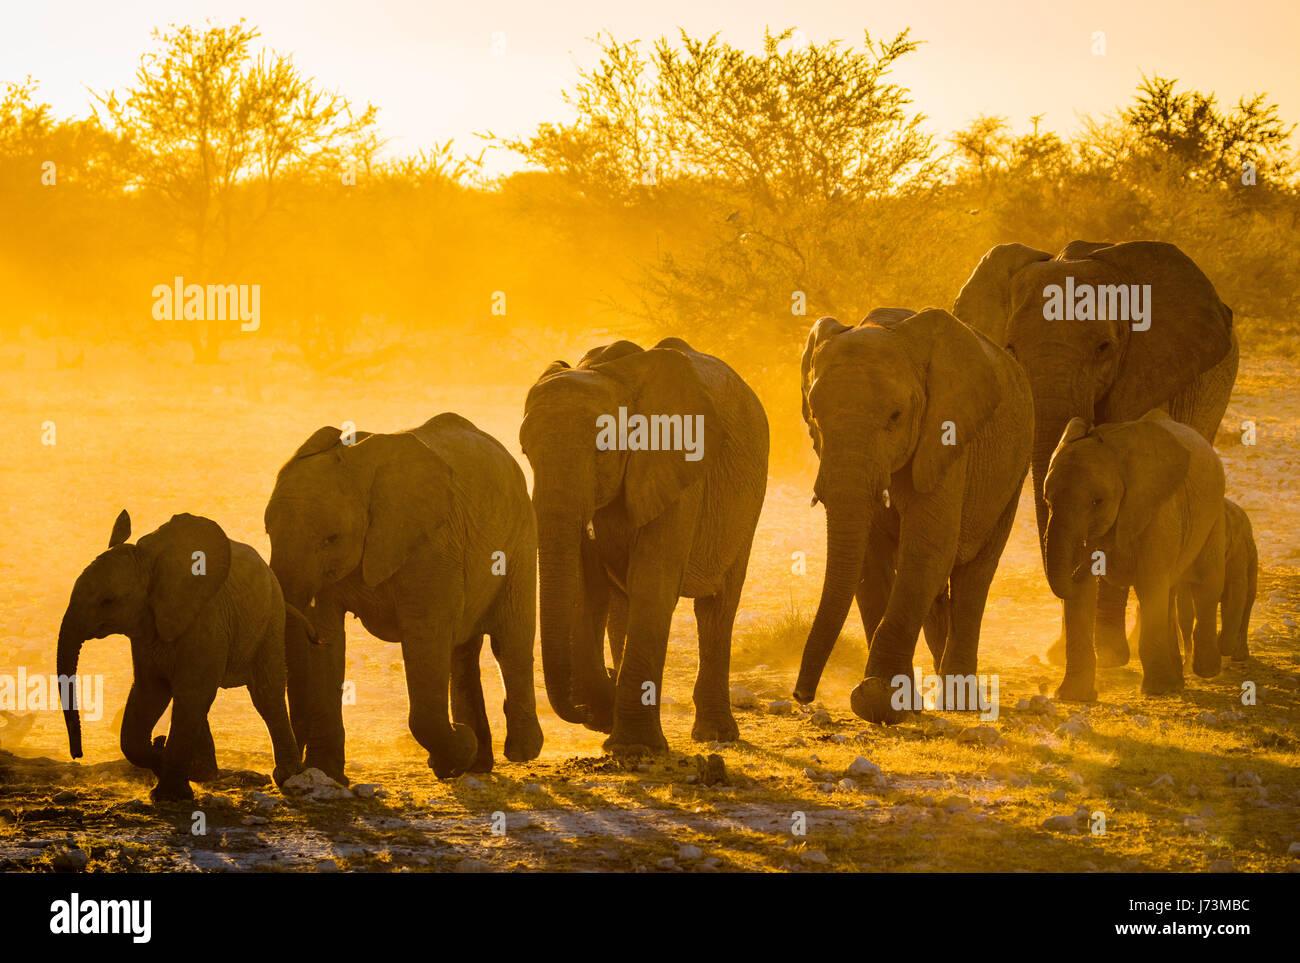 African elephants in Etosha National Park.   African elephants are elephants of the genus Loxodonta. The genus consists - Stock Image